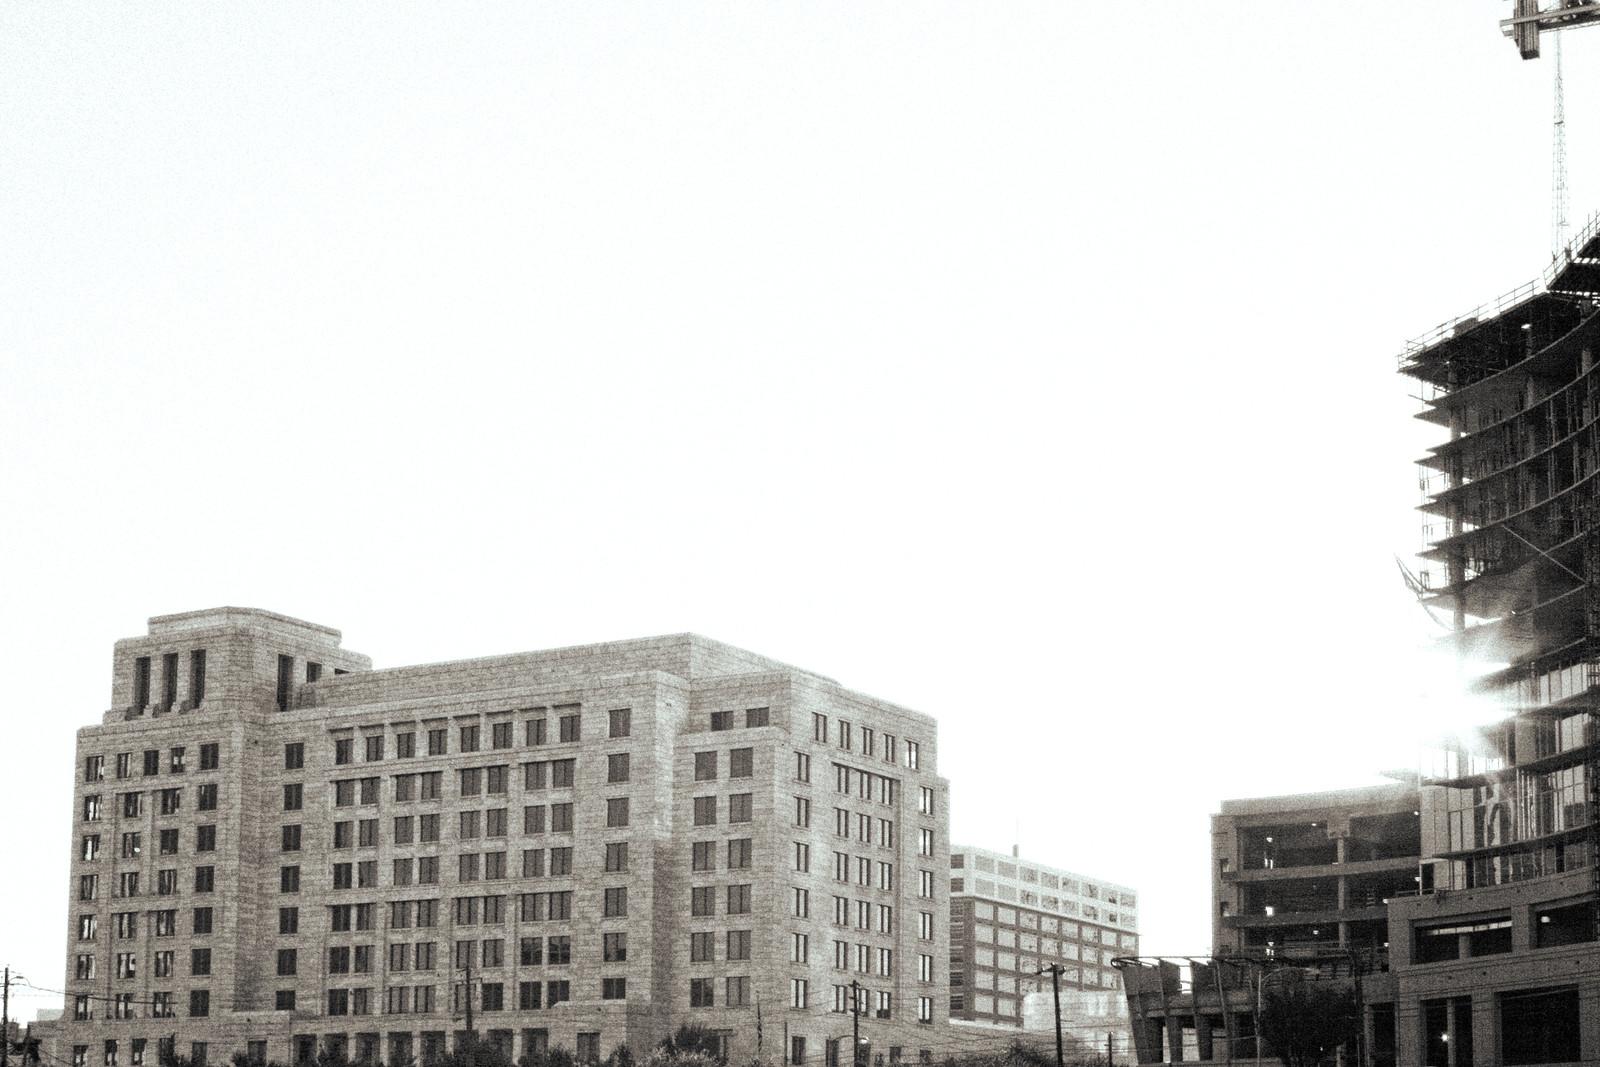 Federal Reserve Bank and Midtown construction, Midtown Atlanta, 2007